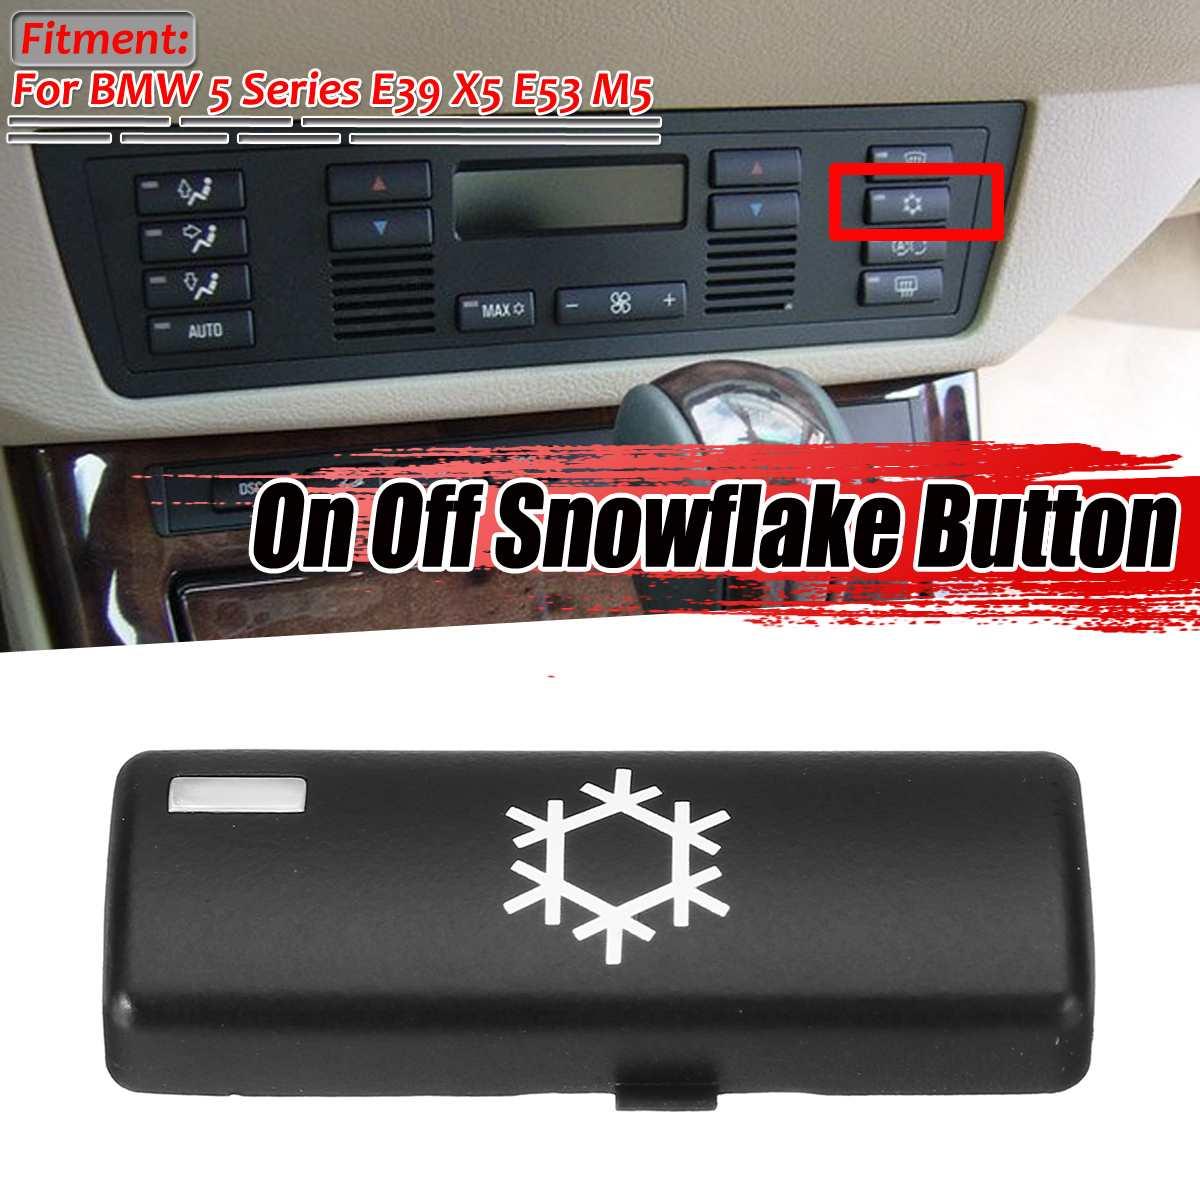 1 Panel de Control On Off de plástico para el clima del coche A/C, copo de nieve, tapas de botón, reemplazo de interruptor para BMW 5 Series E39 X5 E53 M5